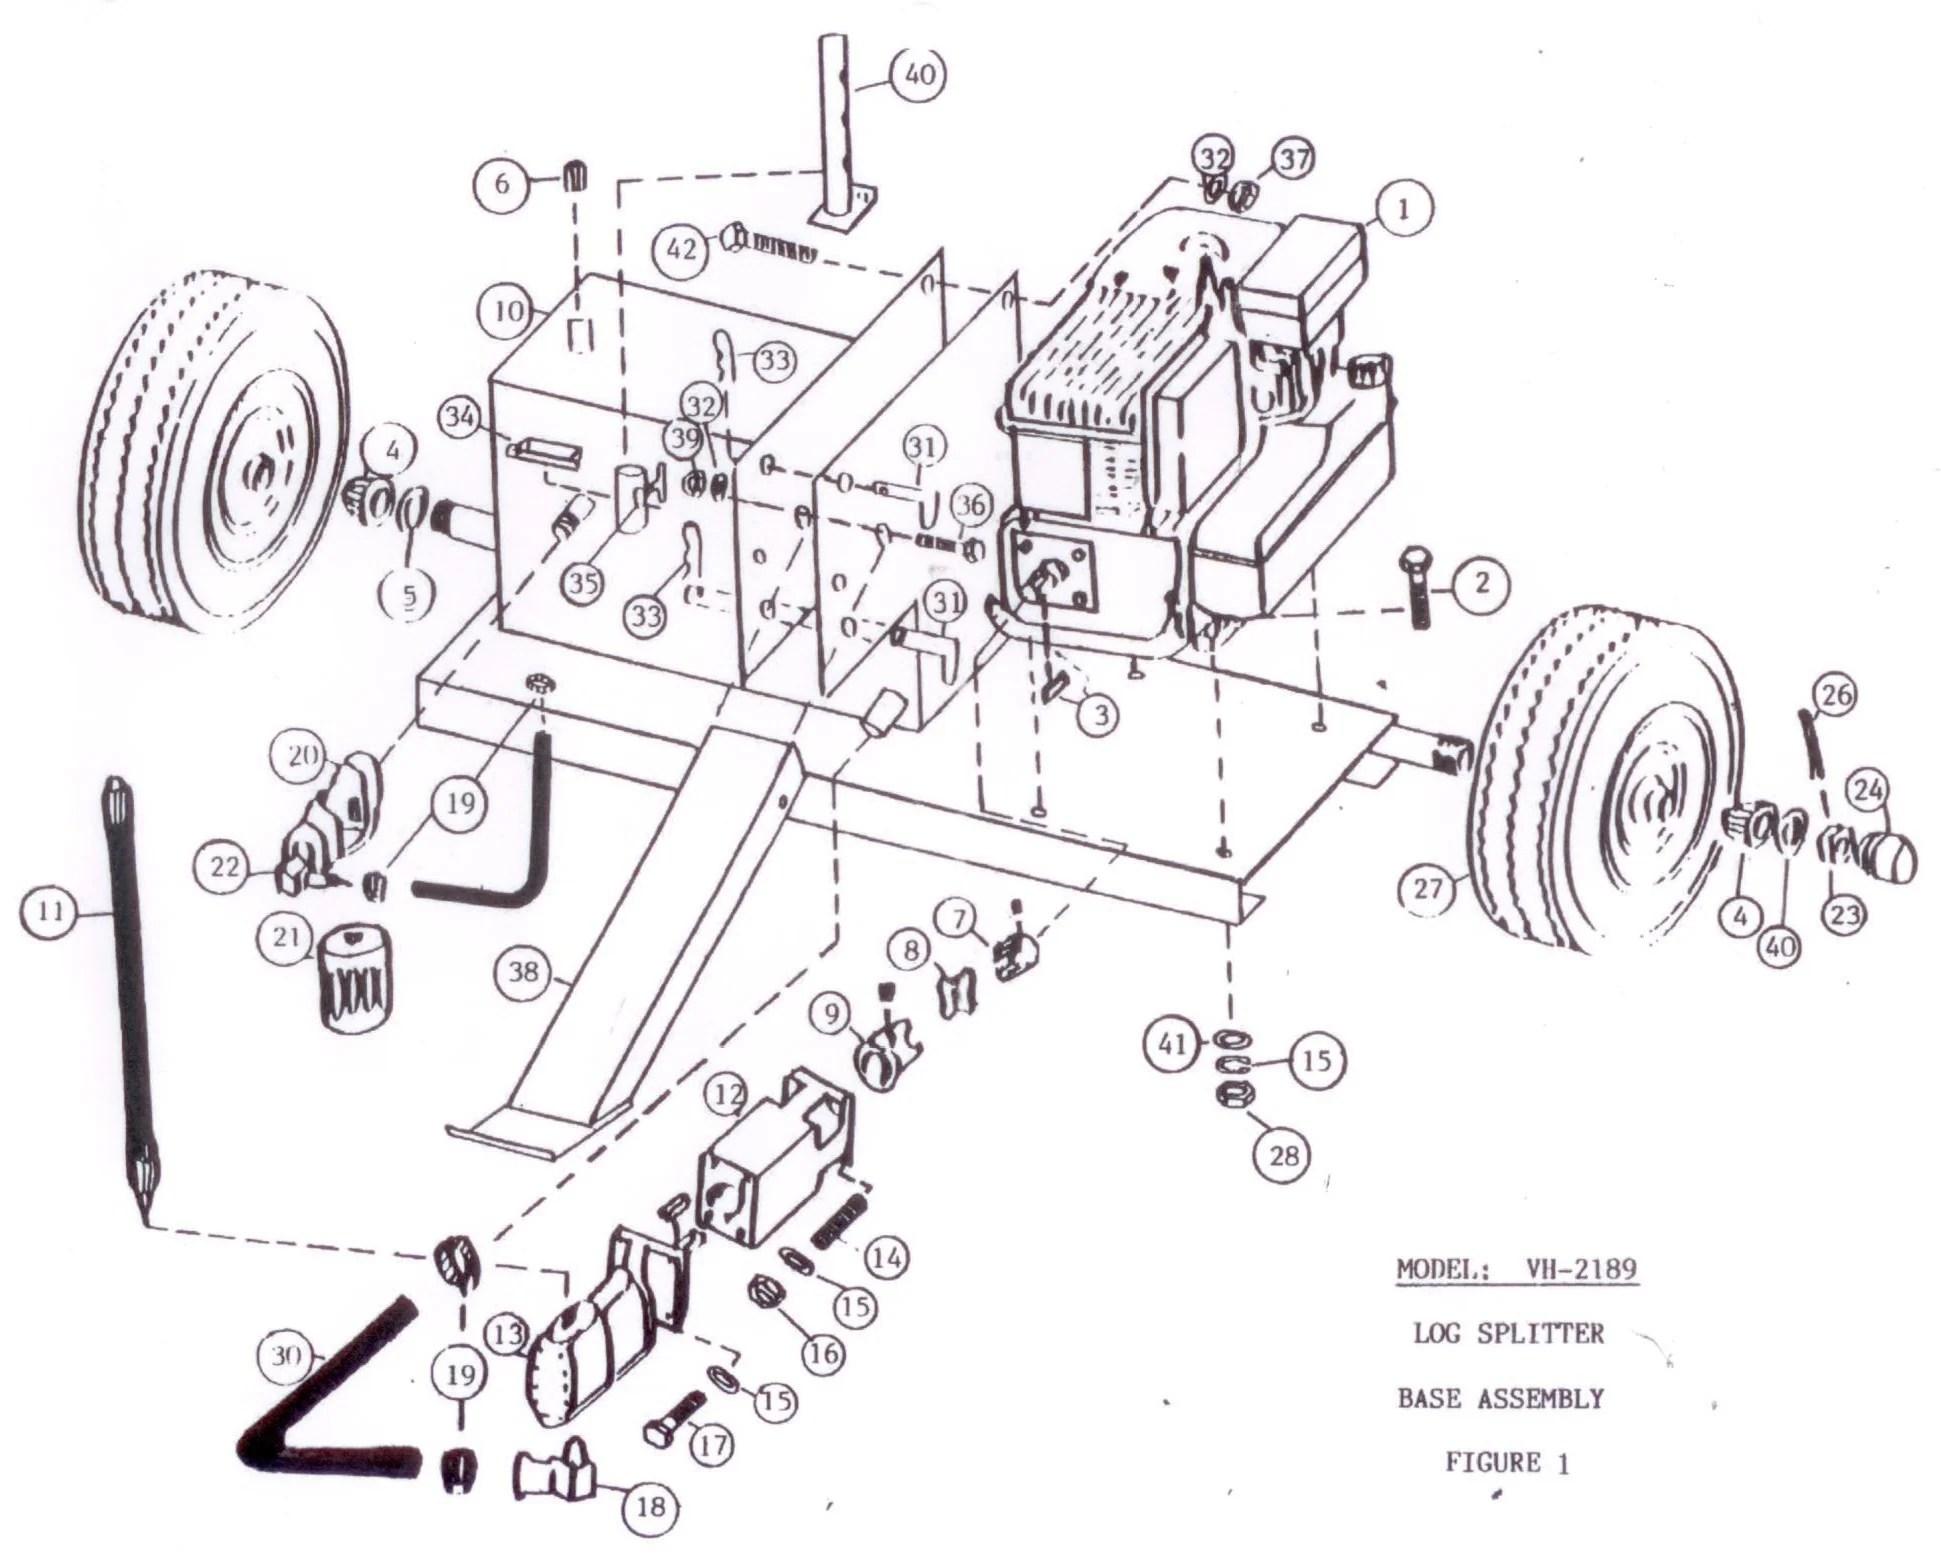 Brave 20-Ton Vertical/Horizontal Log Splitter Parts